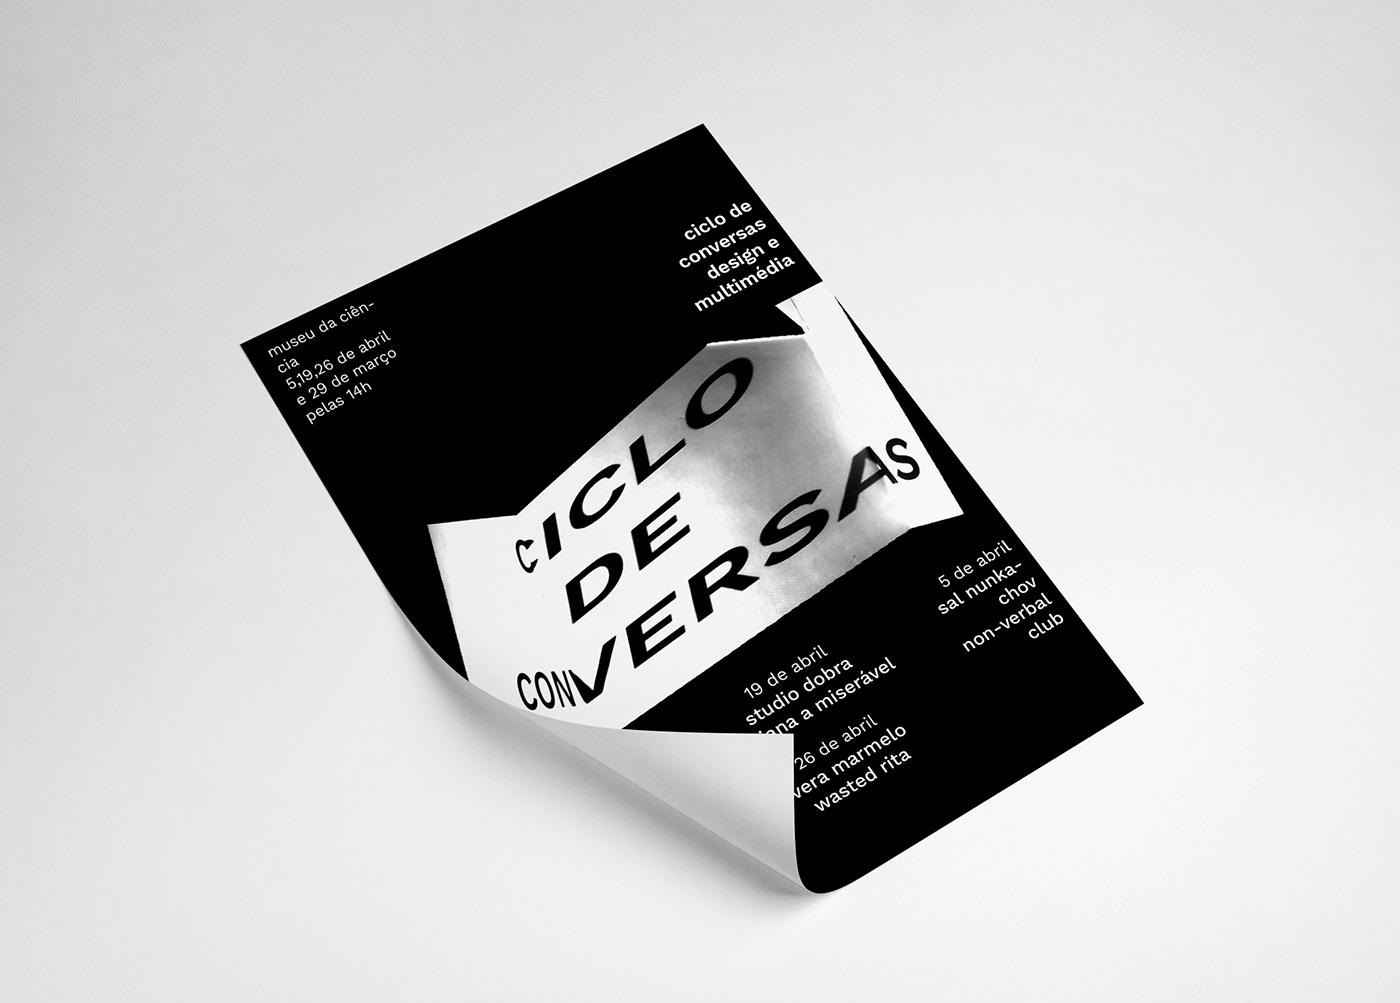 School Project conference graphic design  projections Ciclo de Conversas black White Rebrand